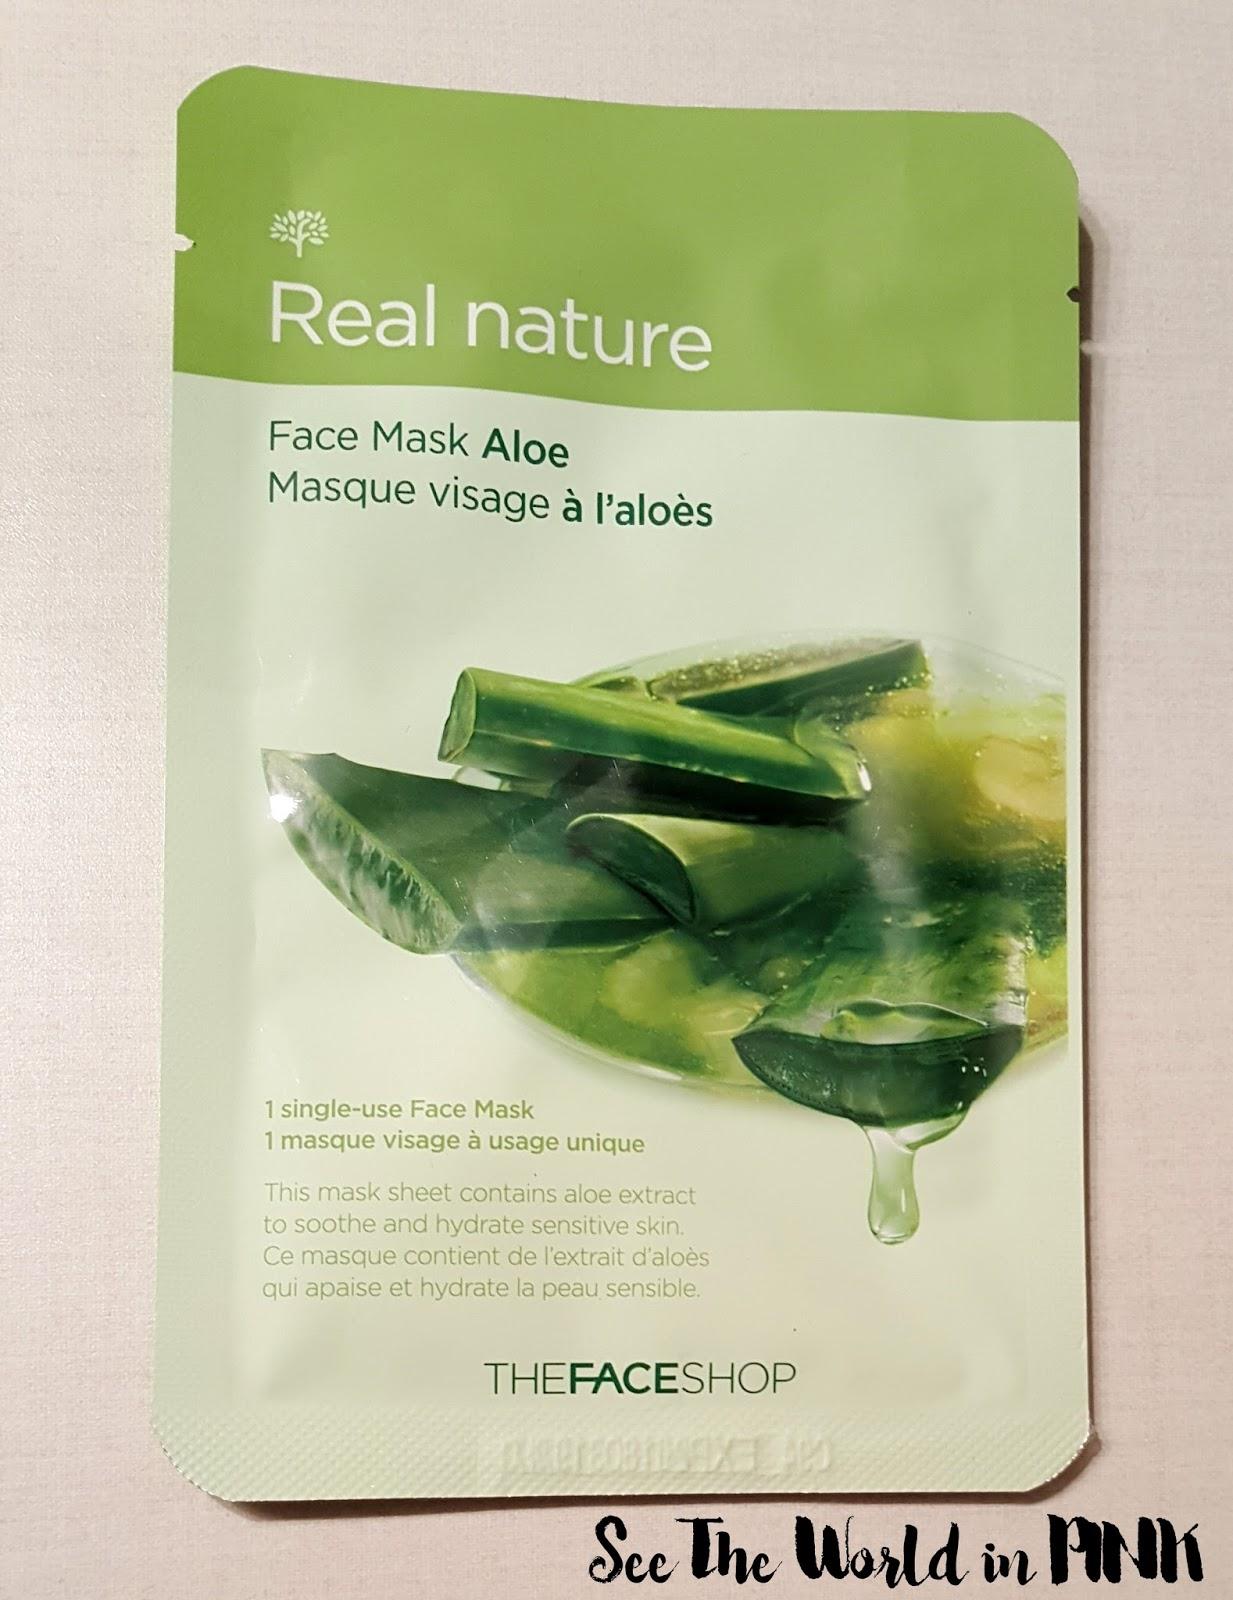 the face shop real nature mask aloe